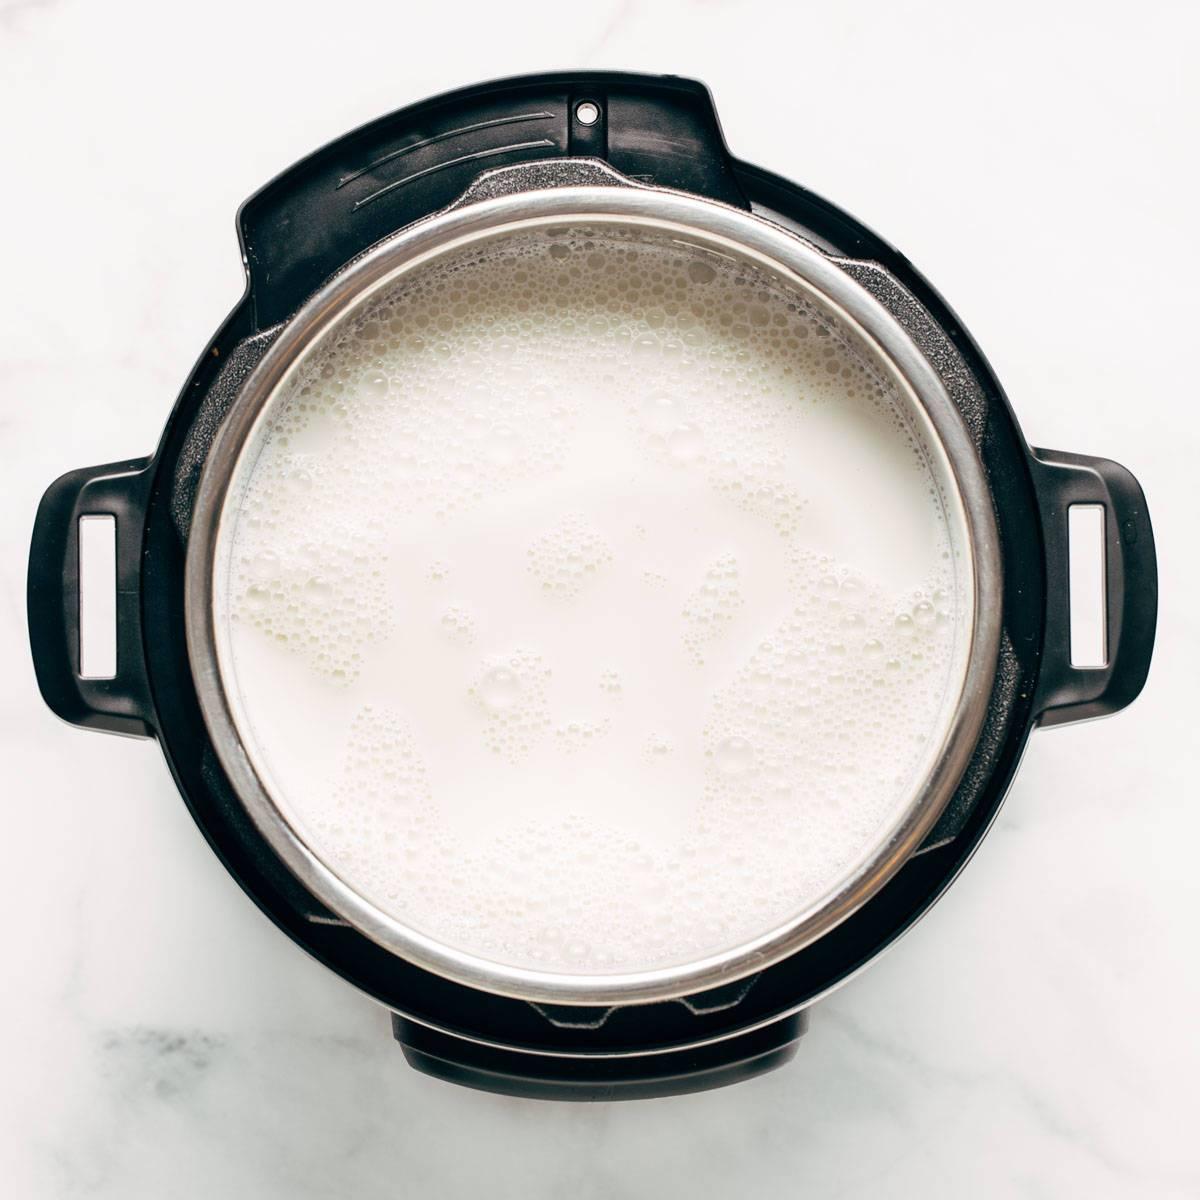 Yogurt in the Instant Pot.